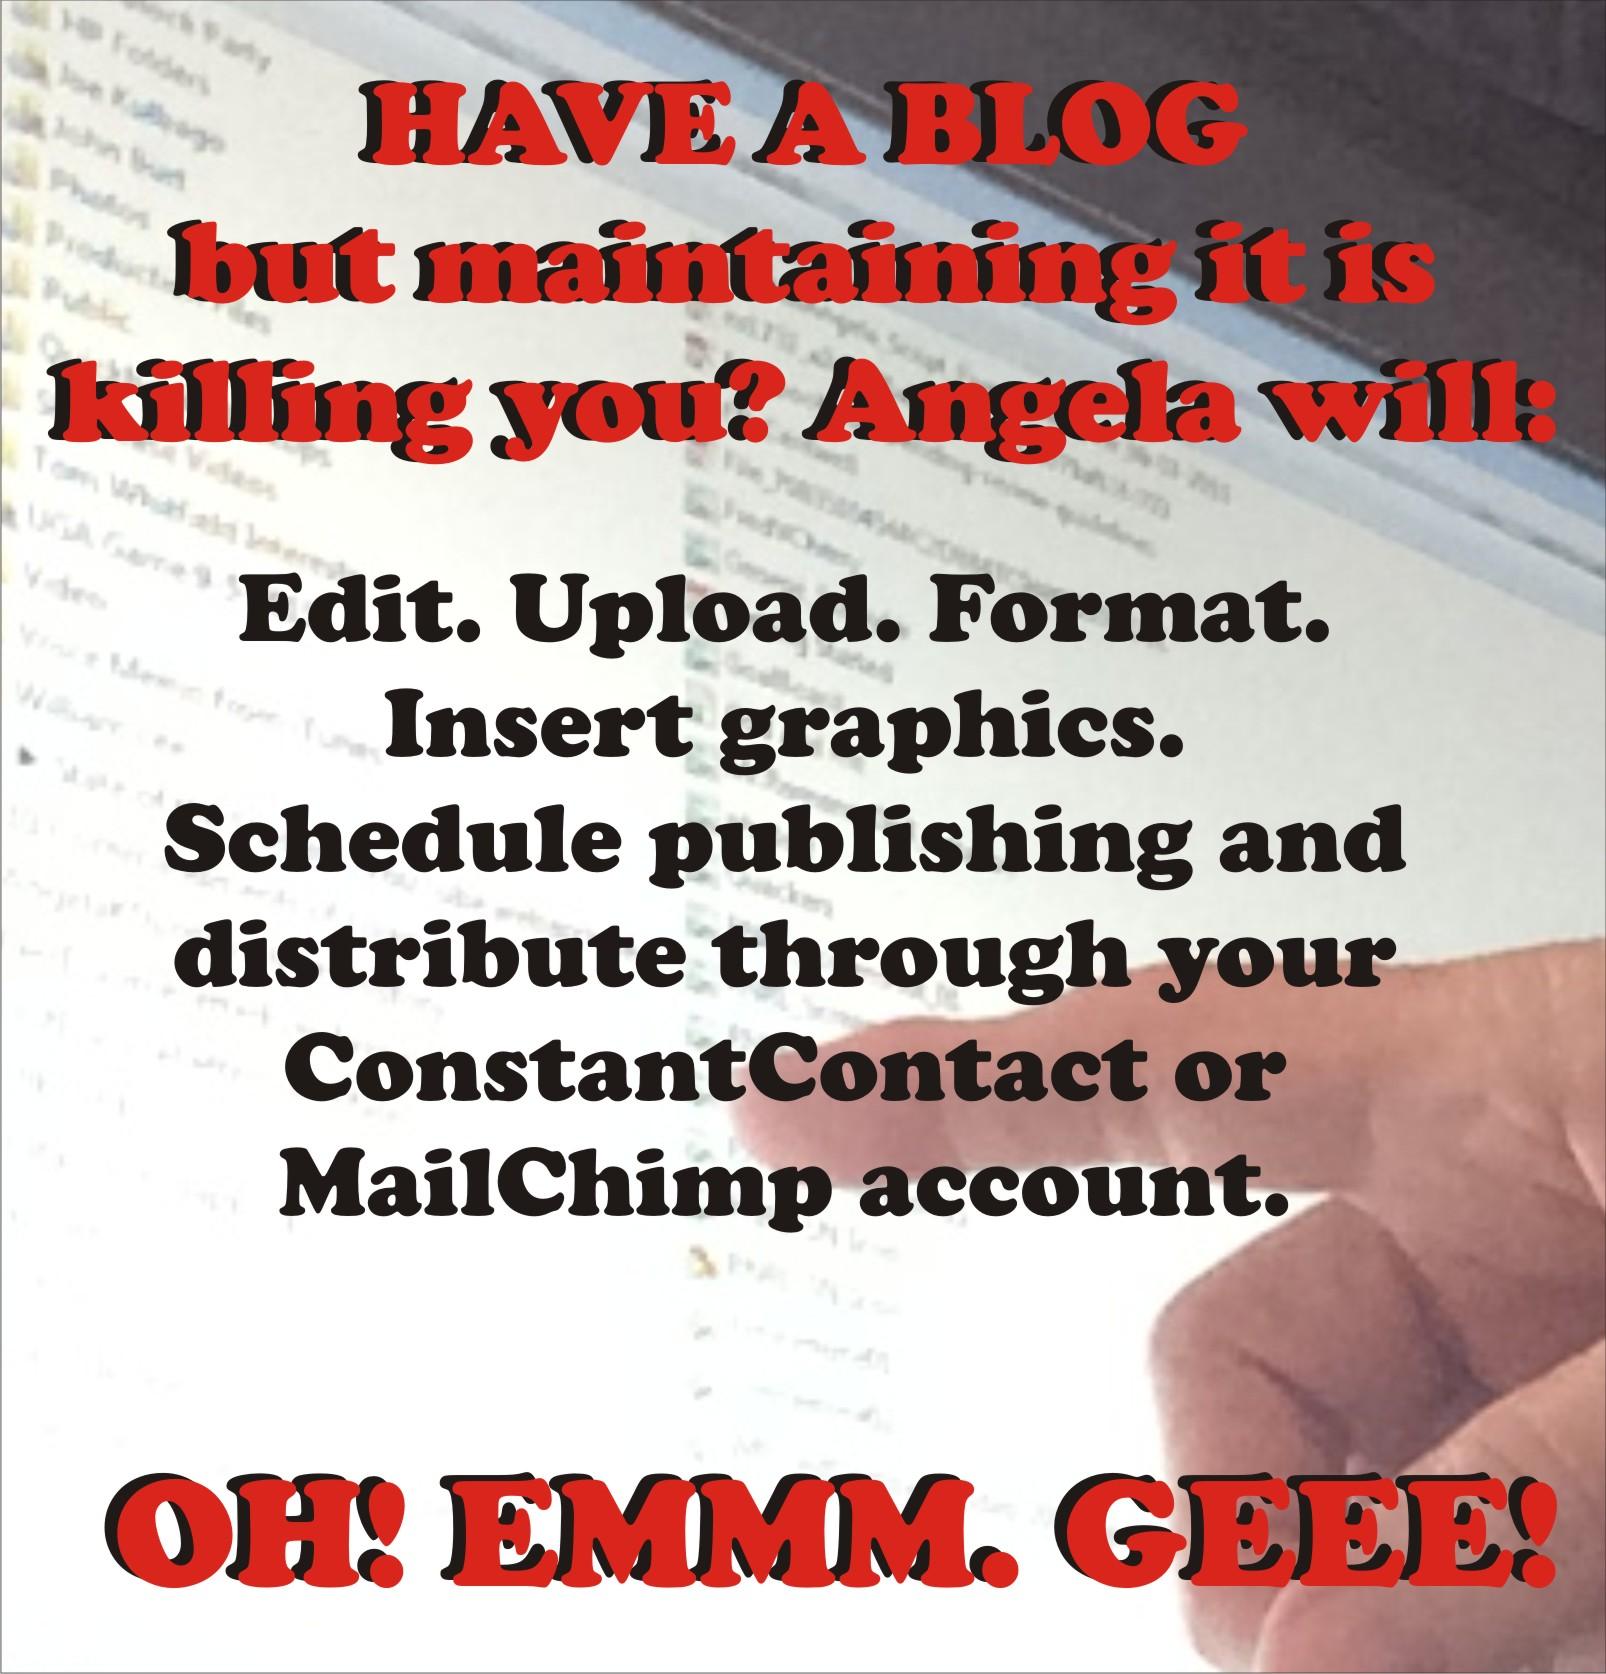 blogupload_emailblast